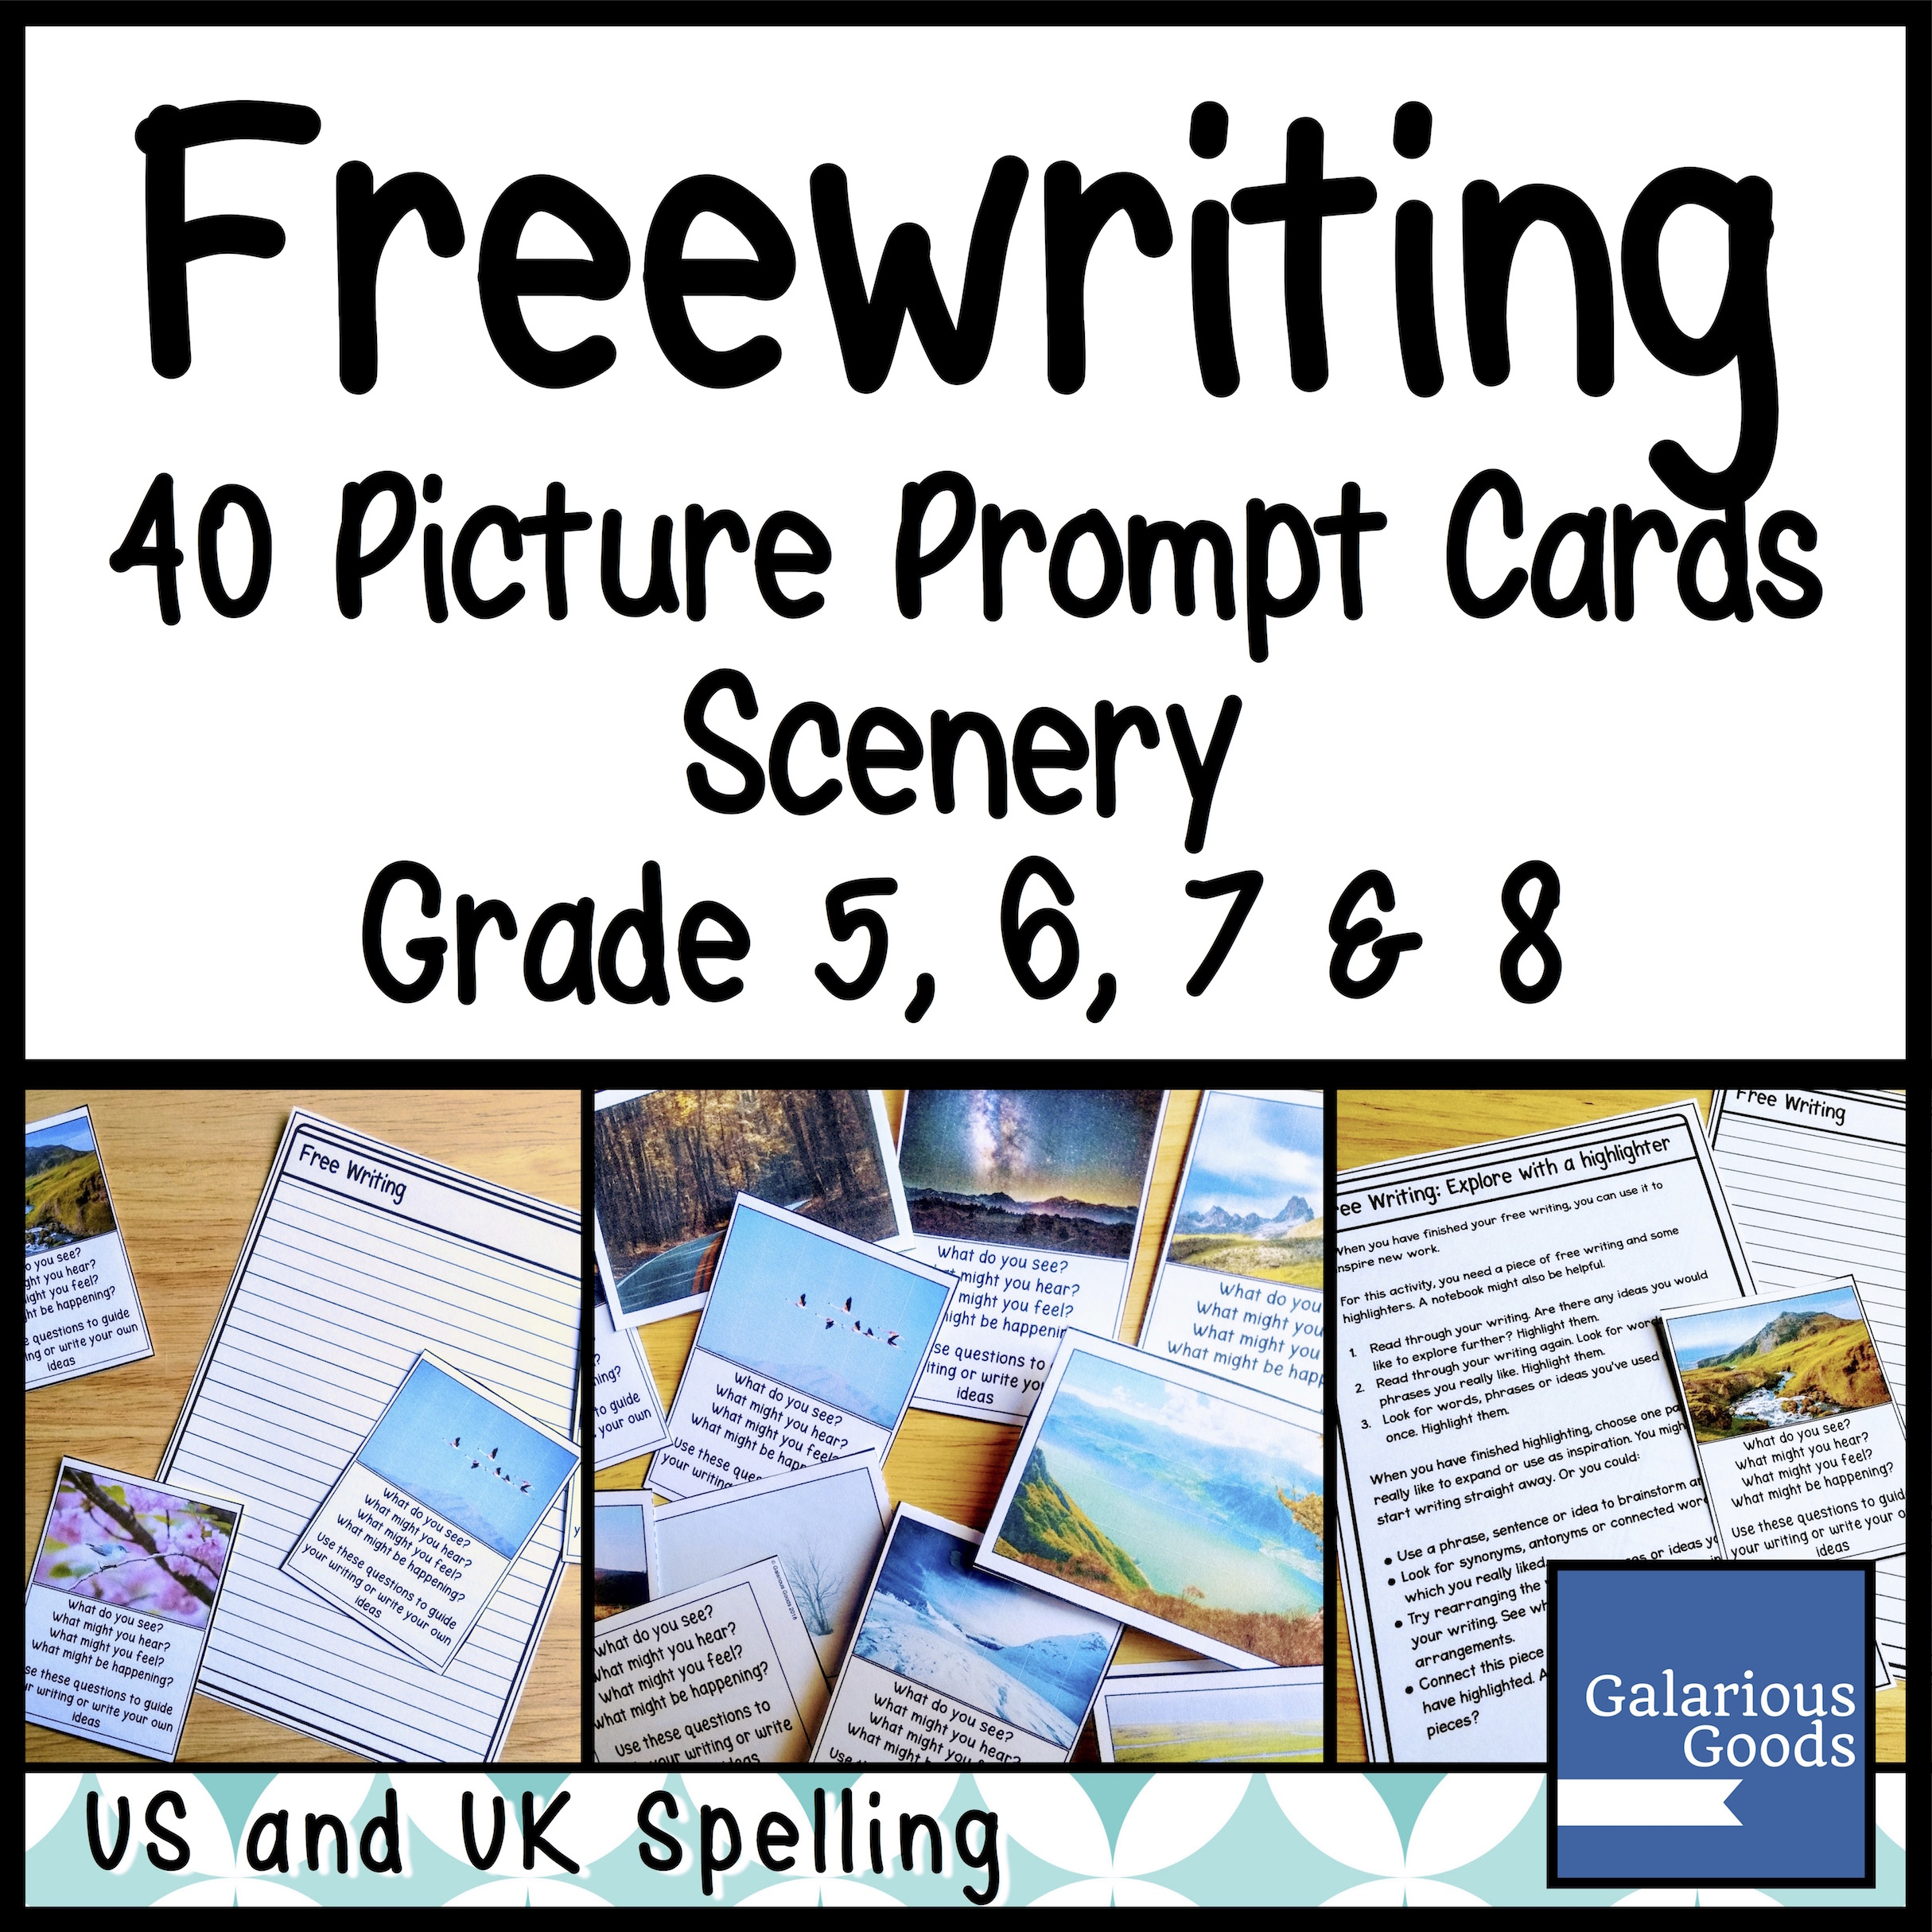 cover freewriting prompt scenery.jpg